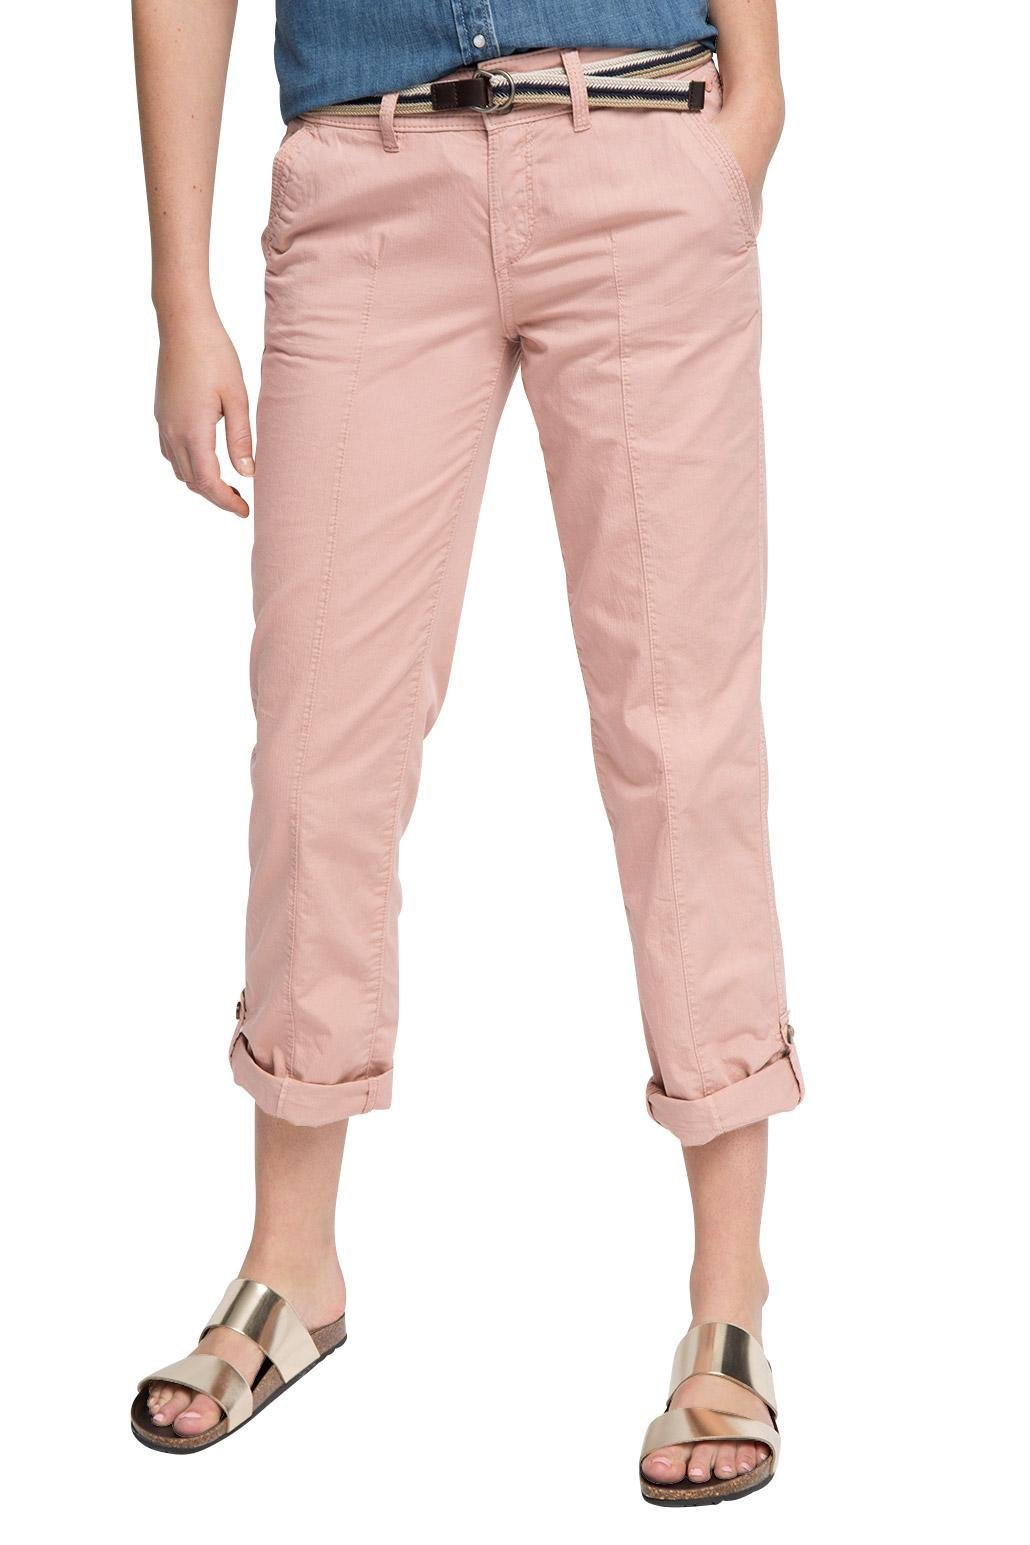 680W38 l30 Rose Femme belt rosaold Pink 046ee1b025 Pantalon Esprit ZOPuTwXik